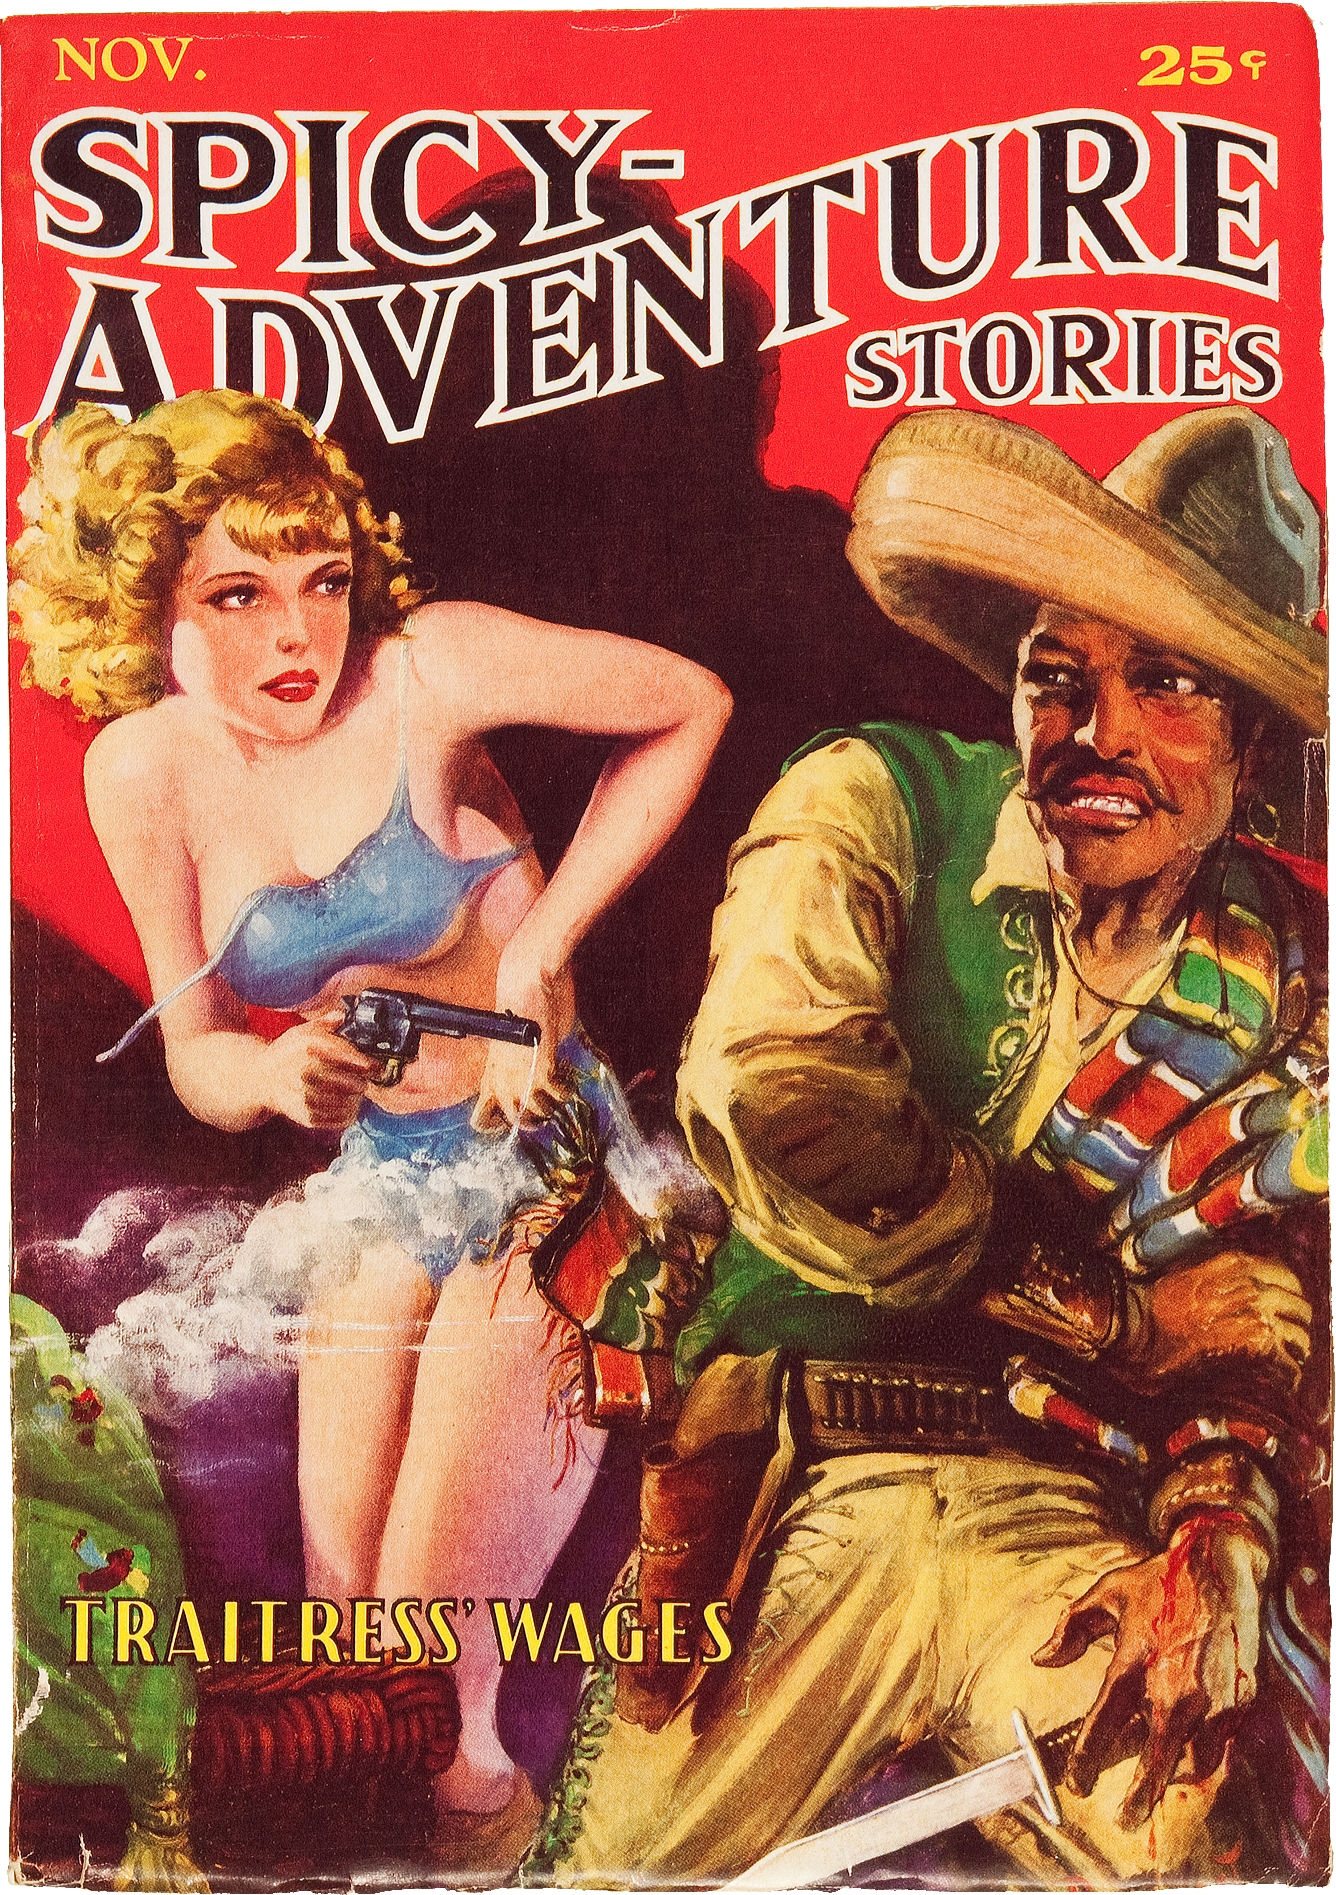 Spicy Adventure Stories November 1935